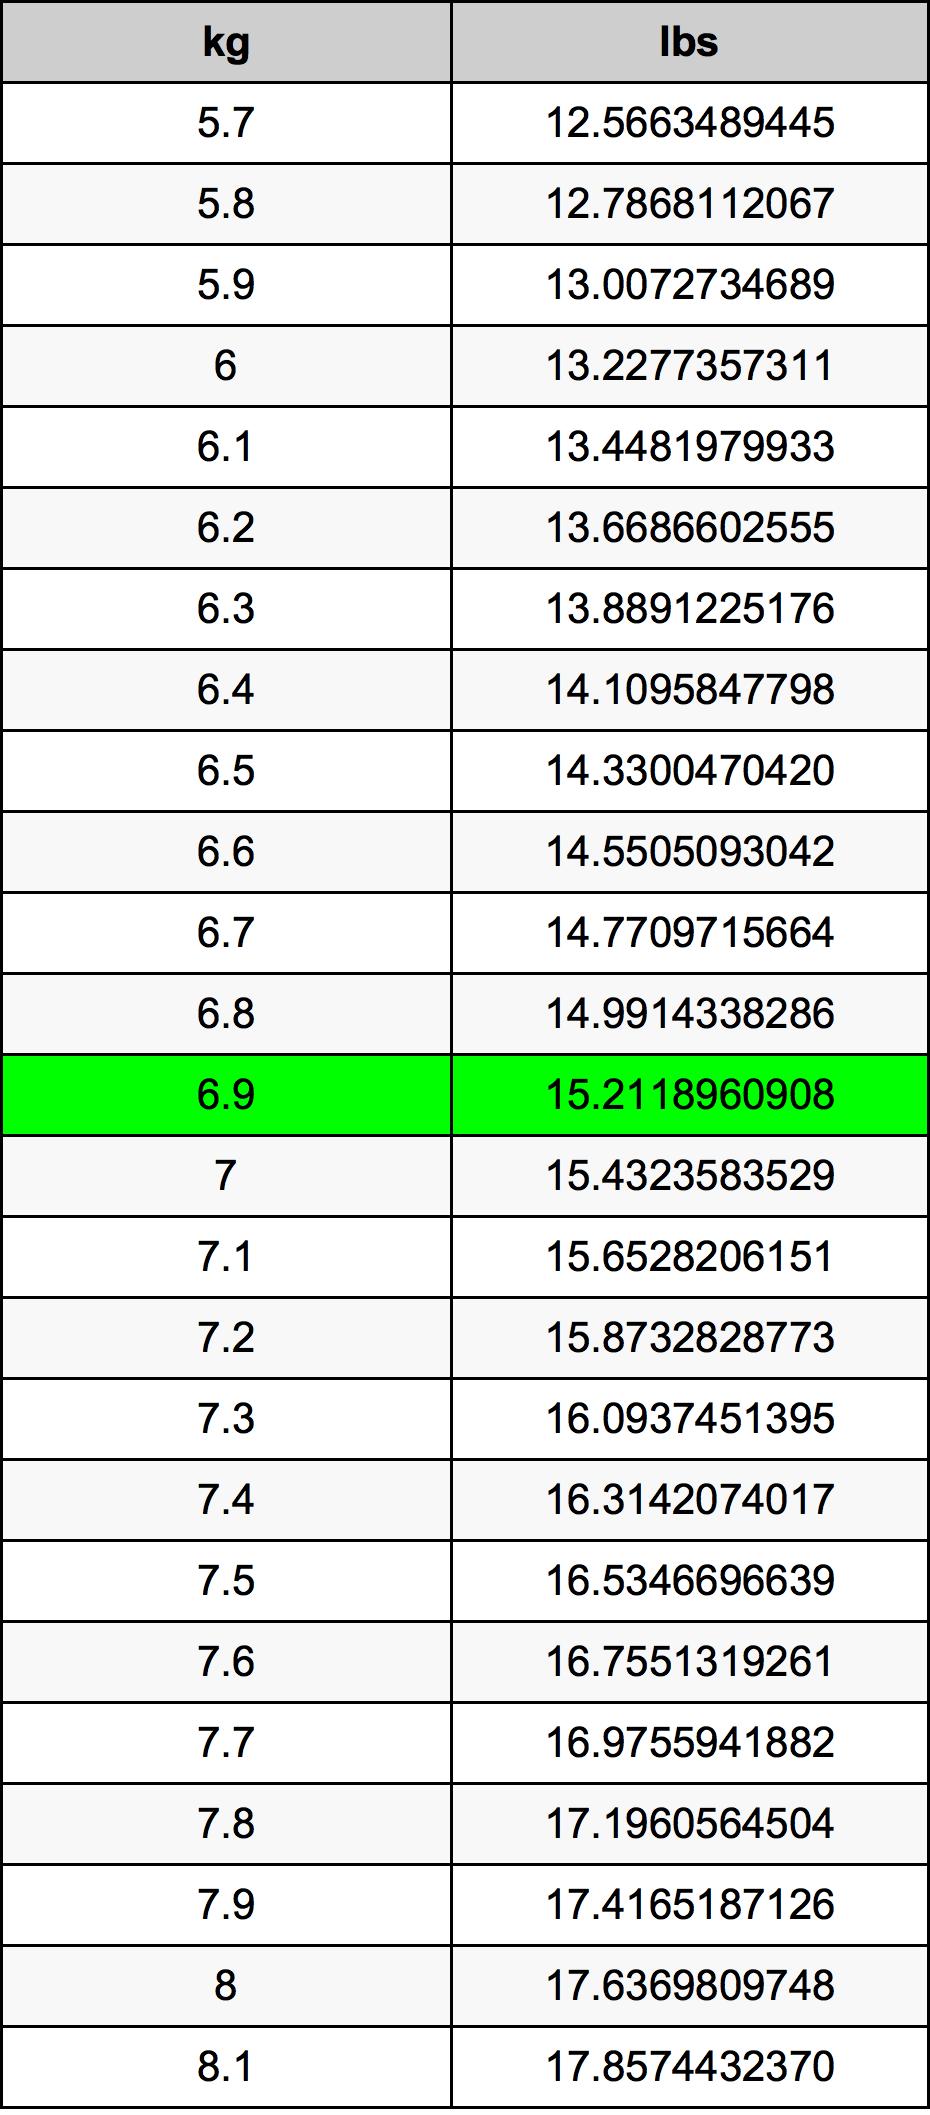 6.9 Kilogramma konverżjoni tabella